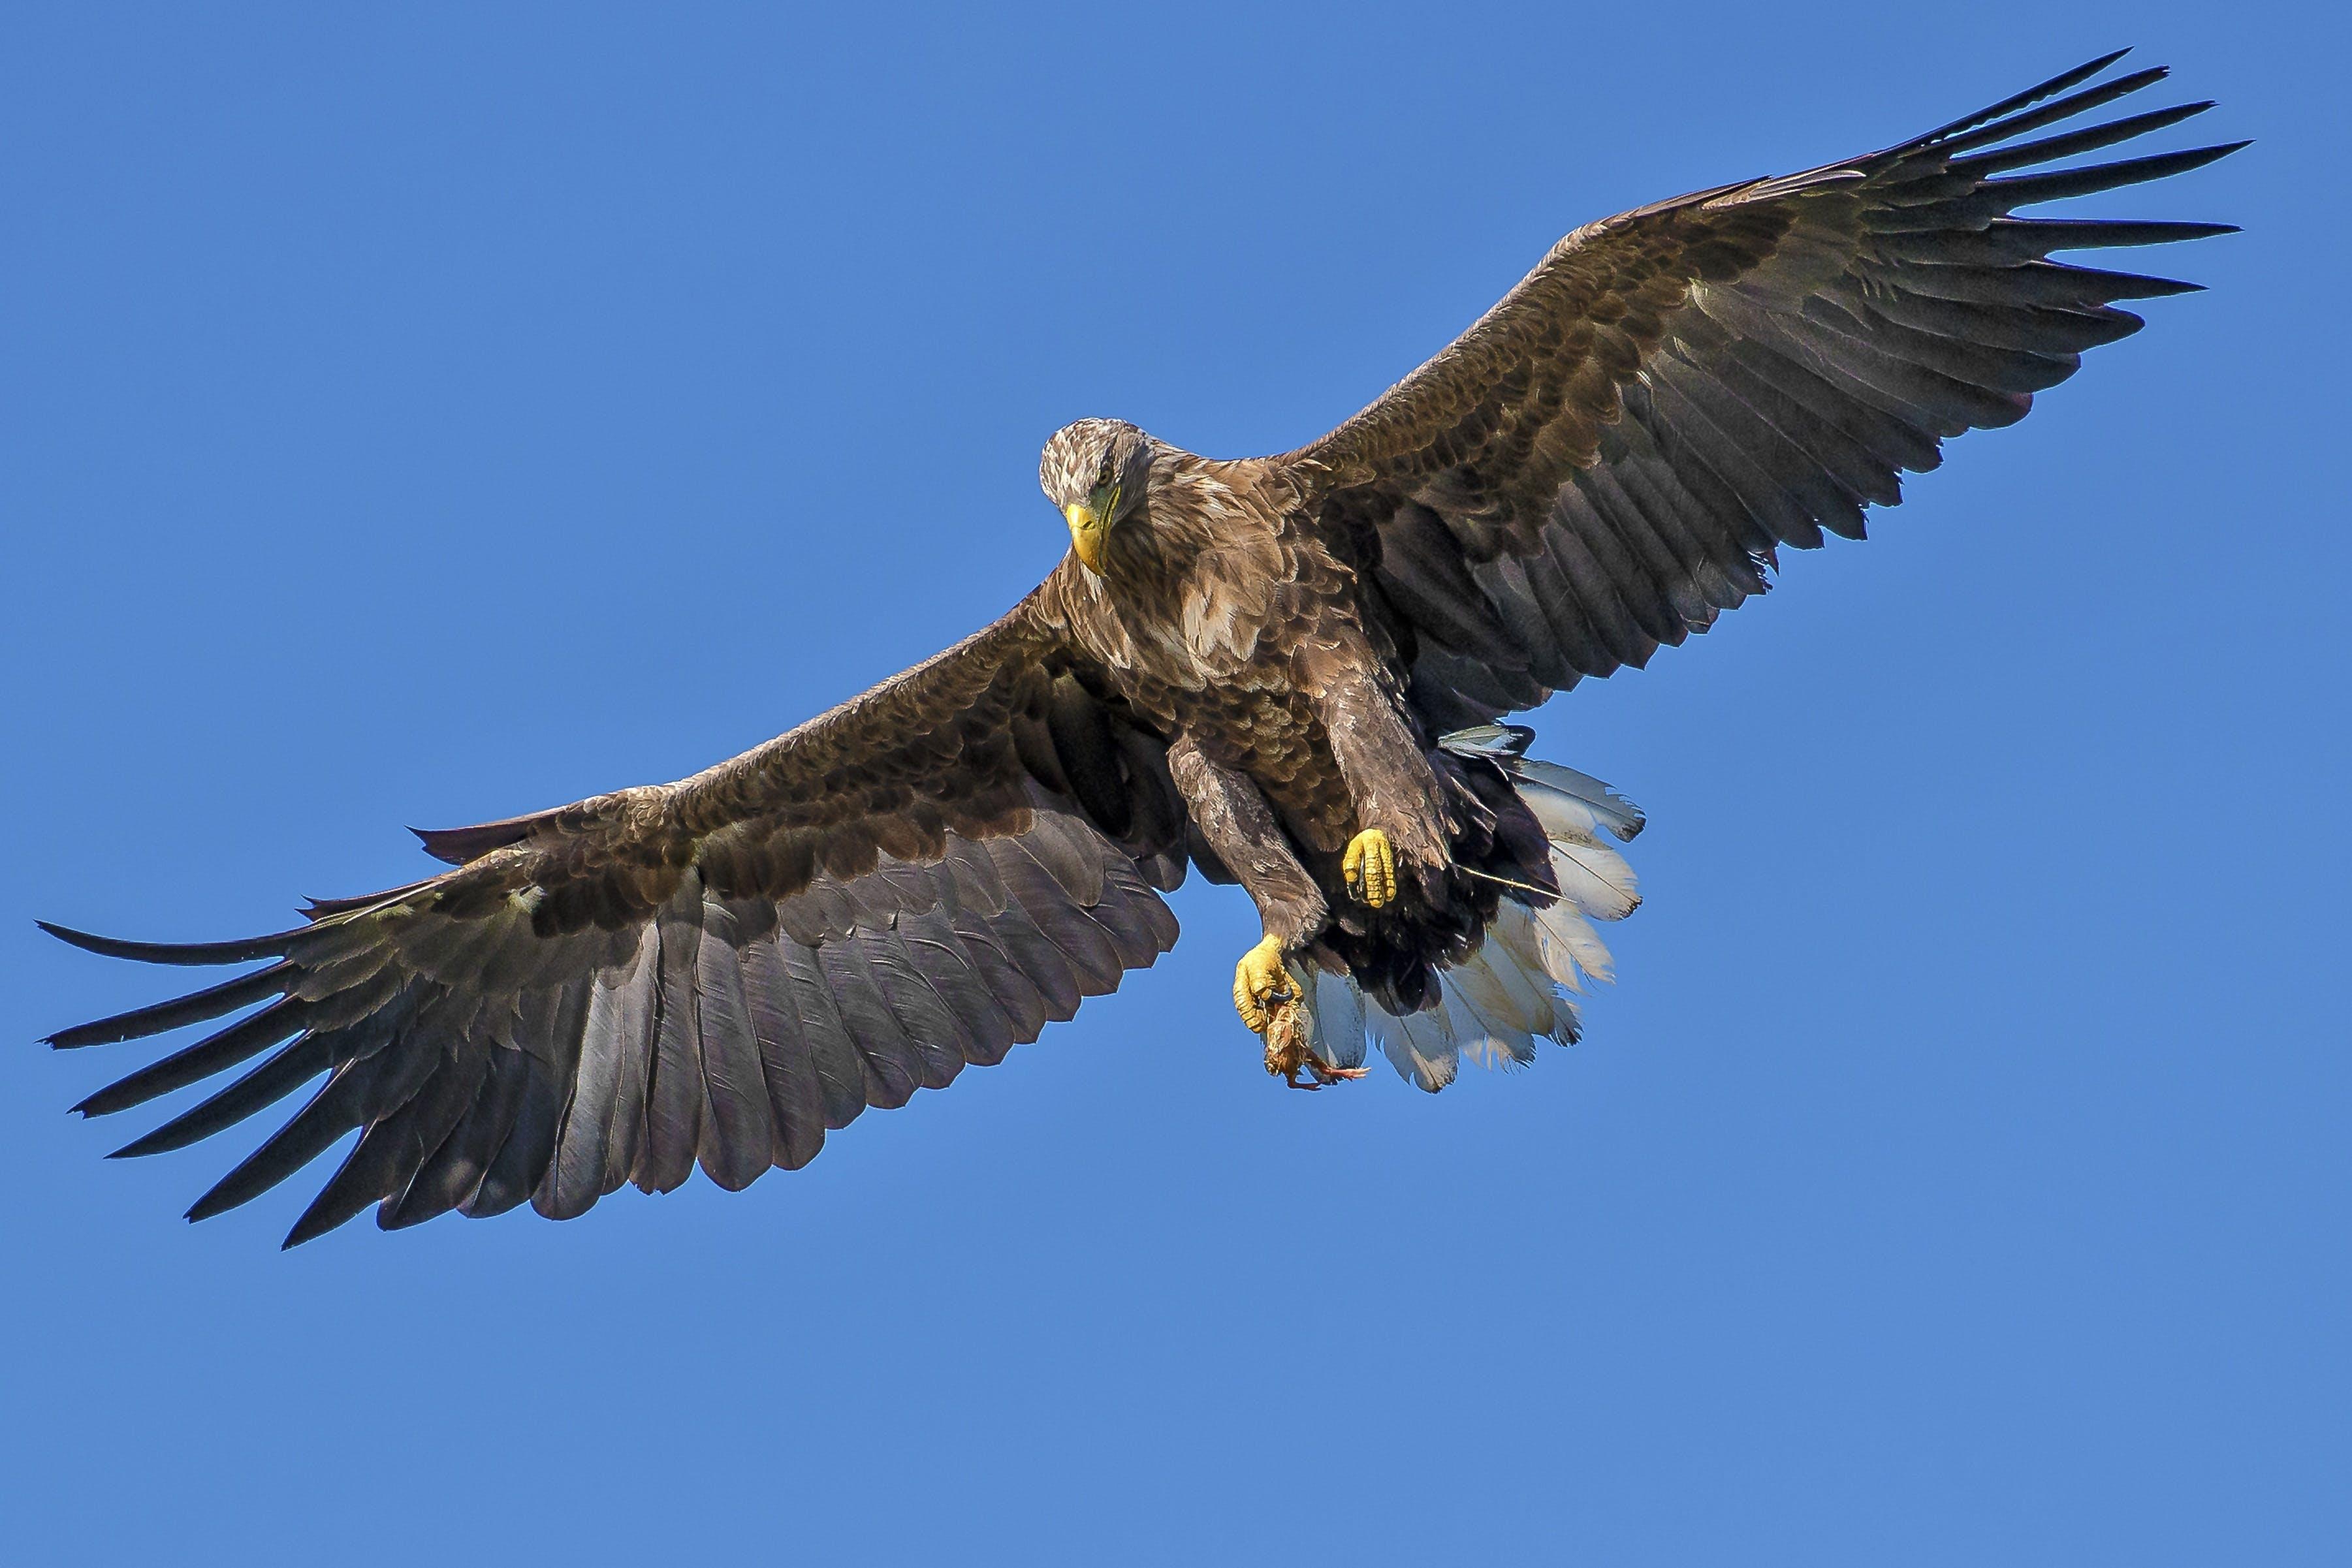 Flying Bird during Day